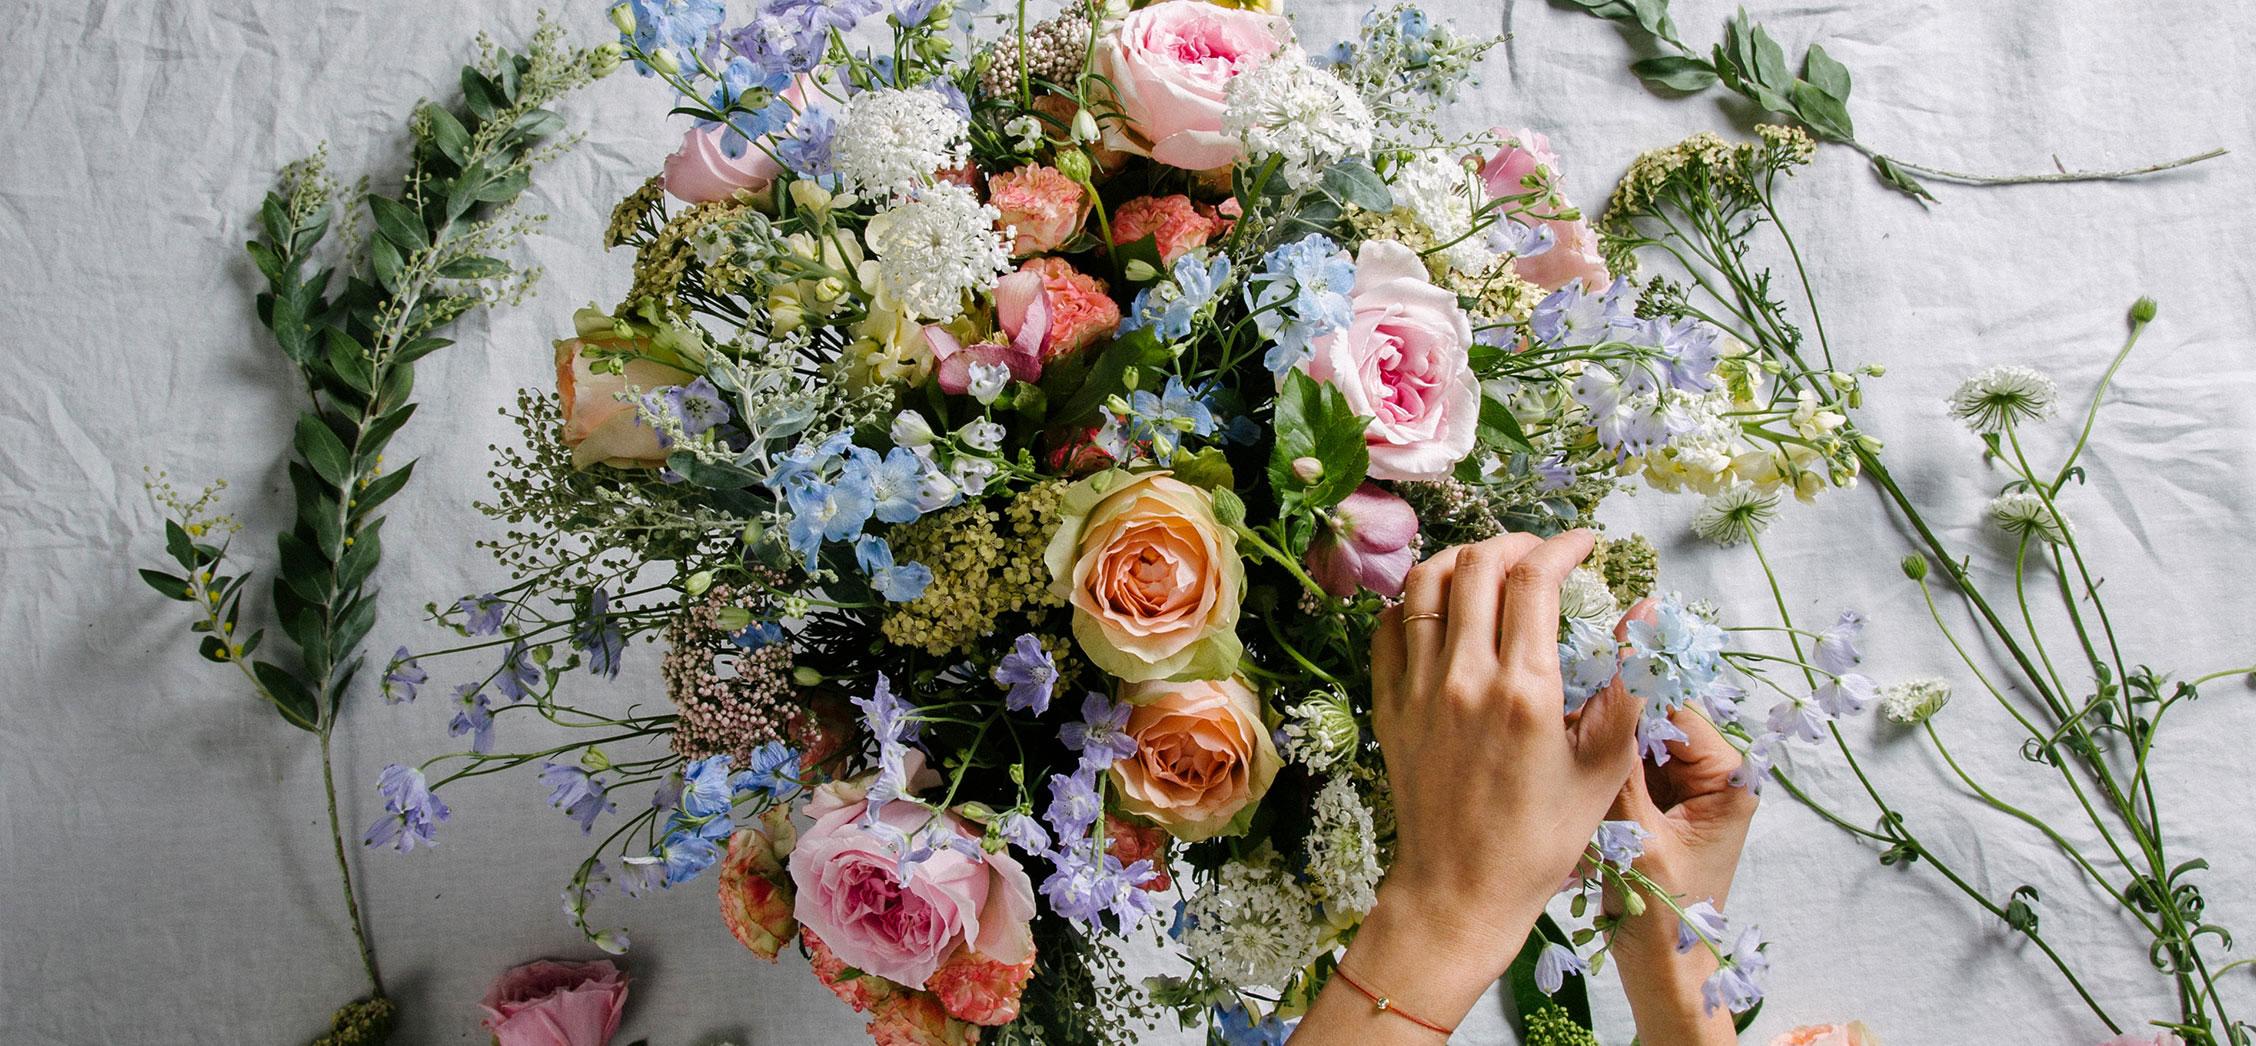 Florist arranging a luxury flower bouquet of garden rose and delphinium. Featuring bespoke bouquet 34.